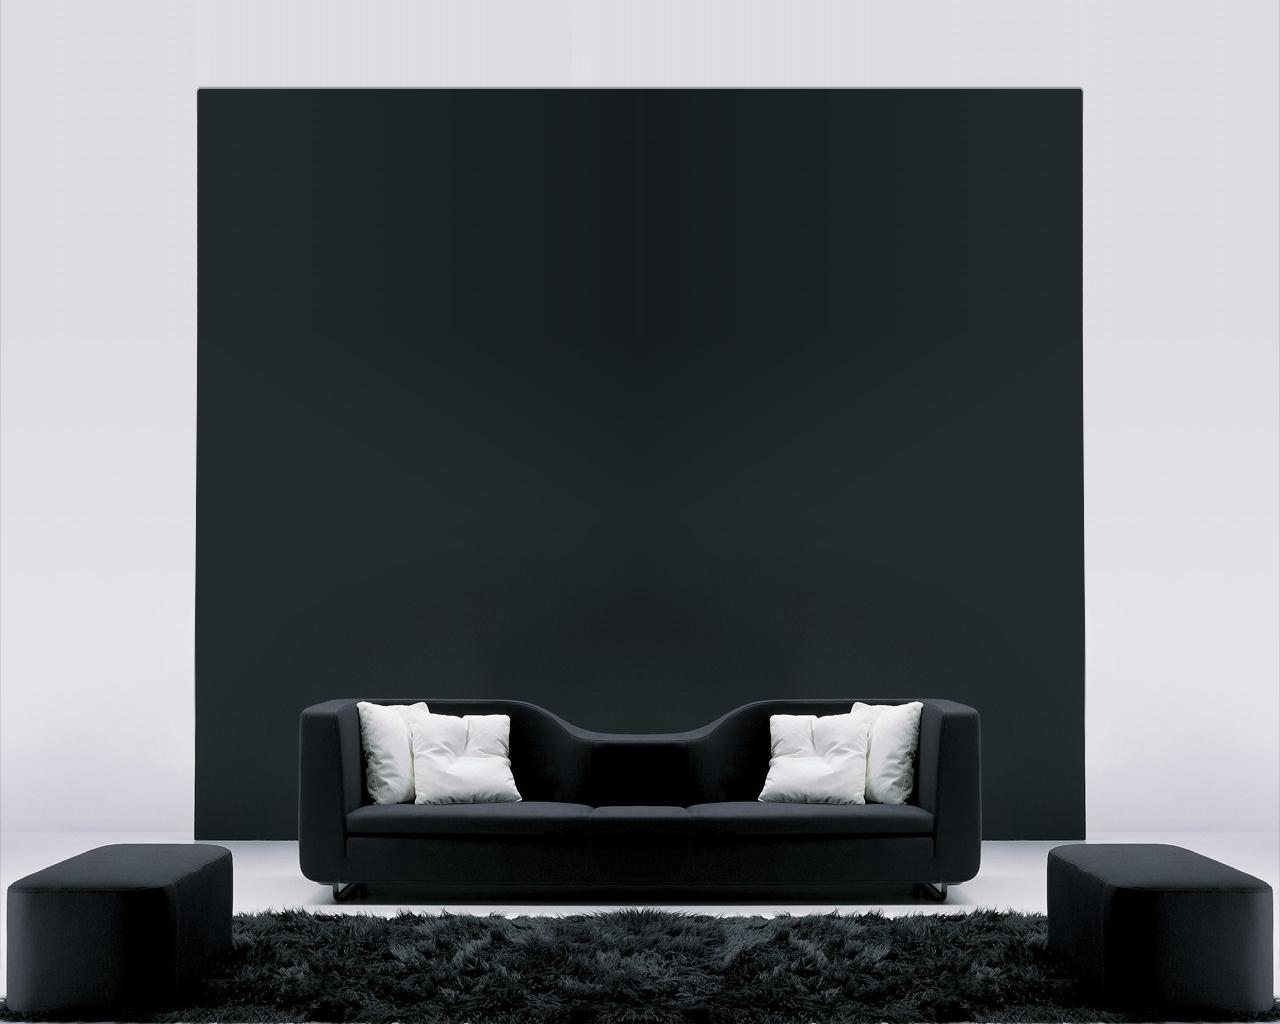 Wall Sofa Murphysofa Wall Beds Fold Perfectly Over Sofas